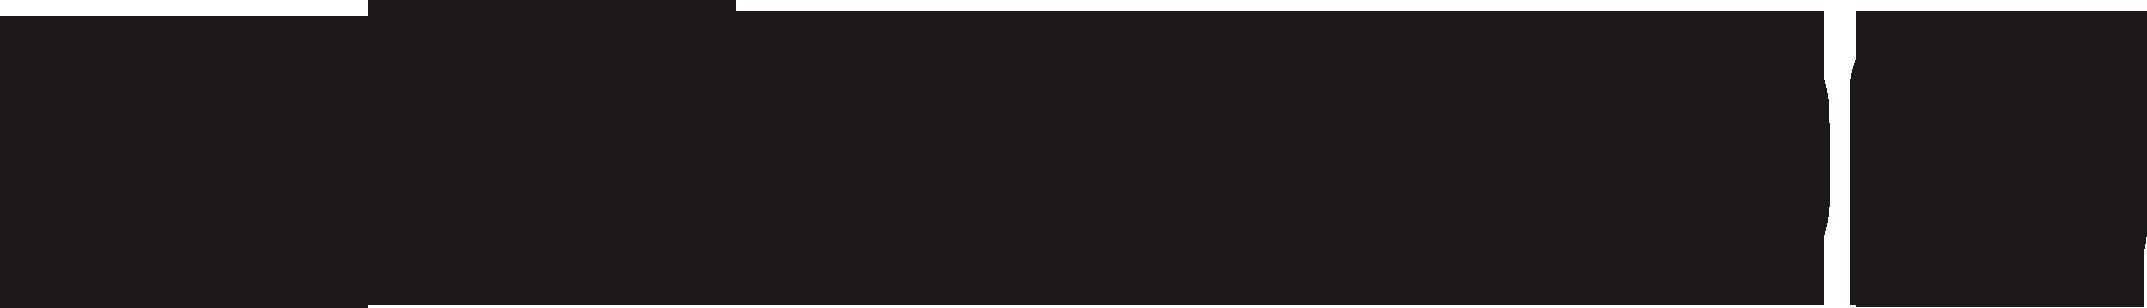 Valeton Logo_Black_V01_160318.png